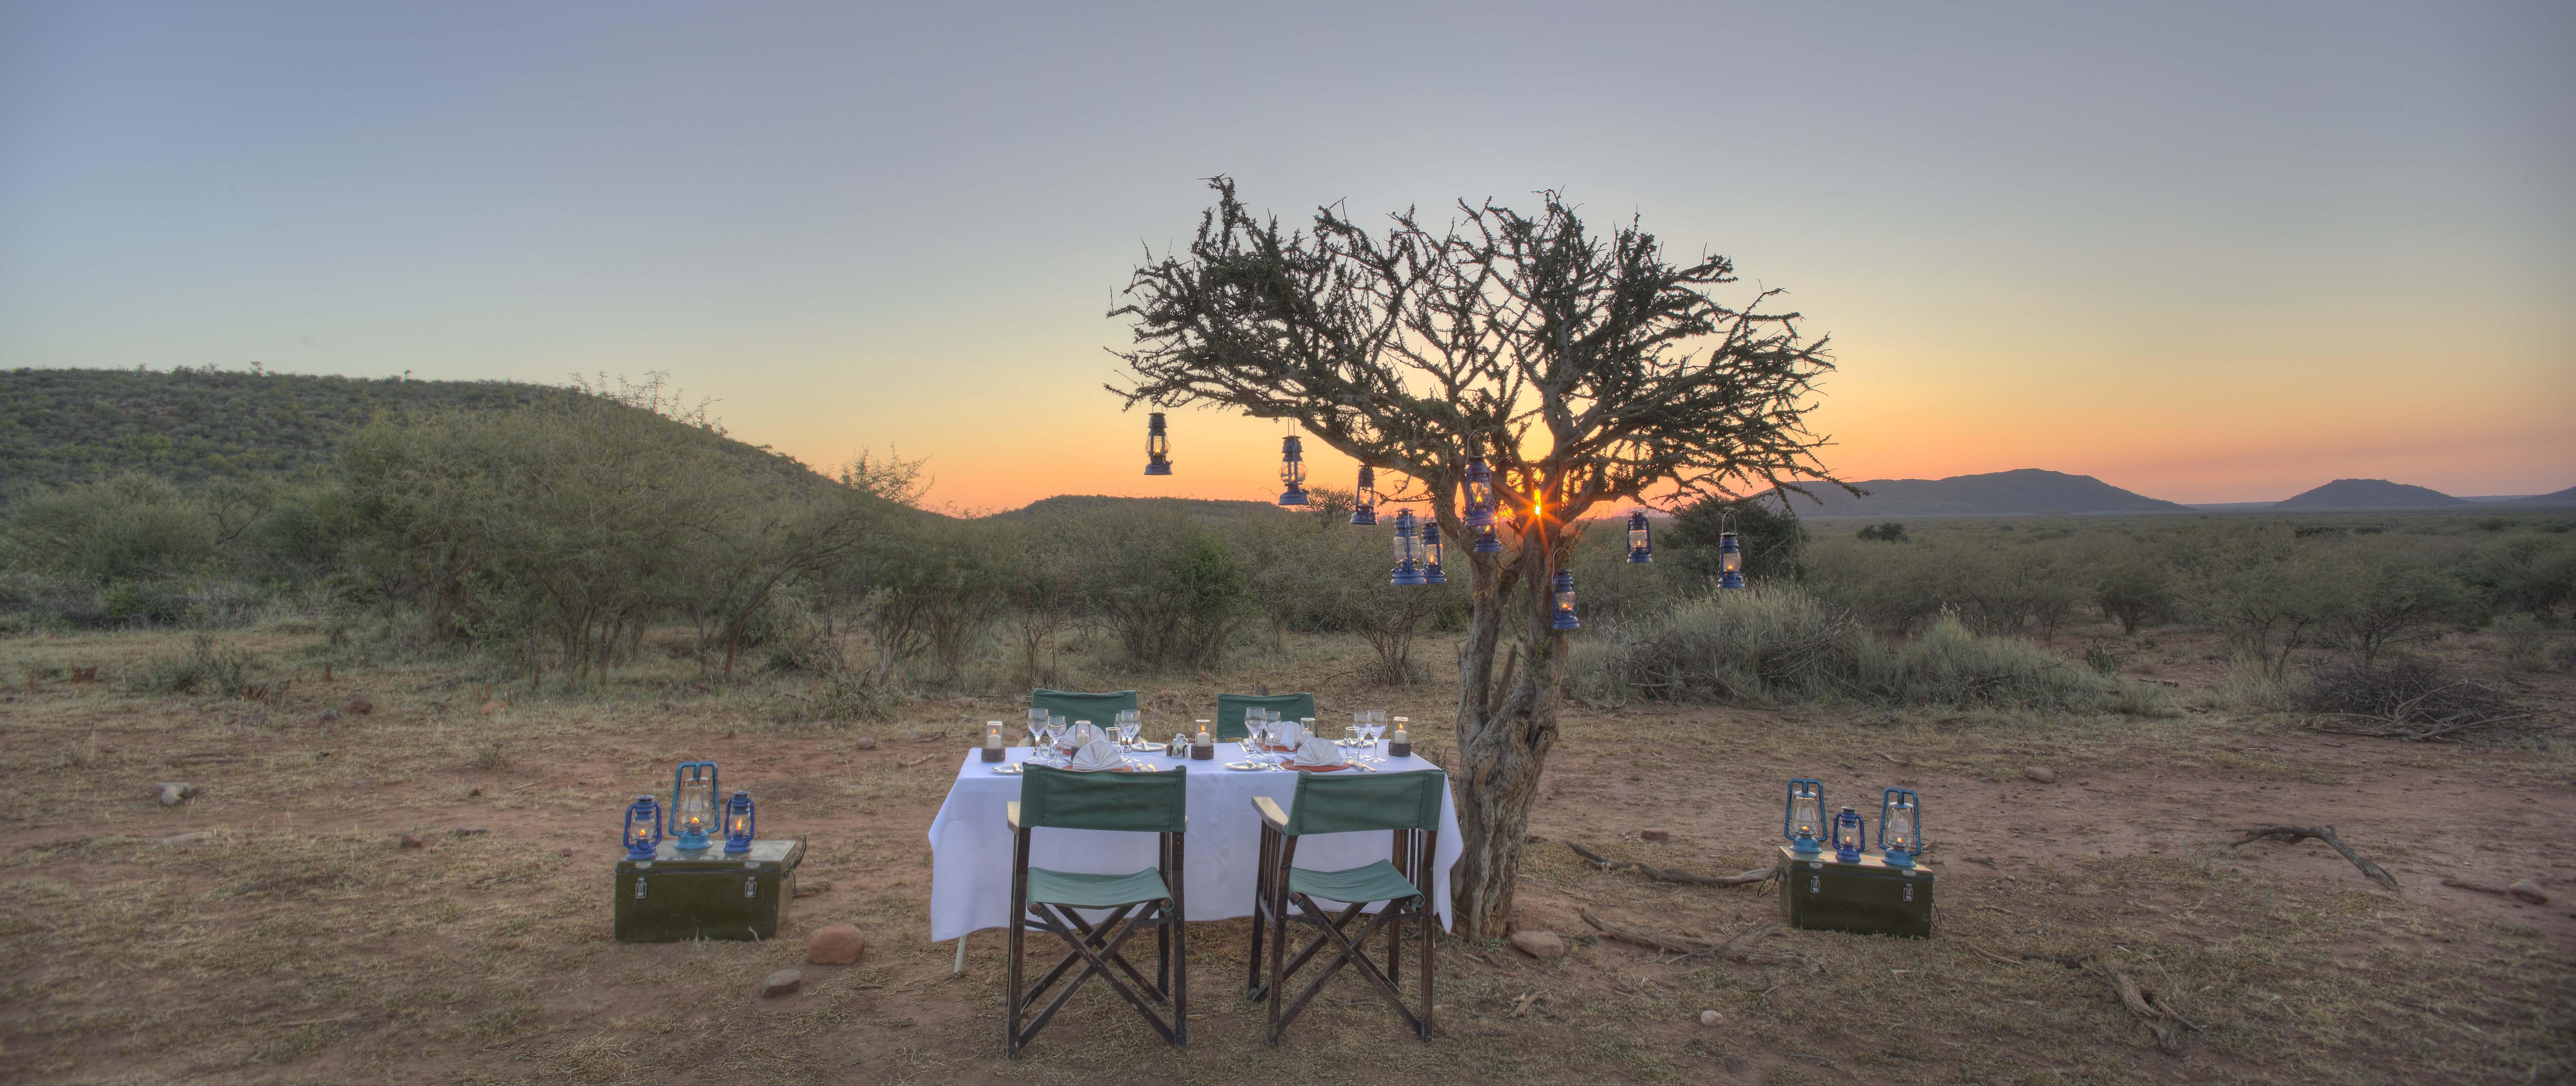 Dusk - Safari - South Africa